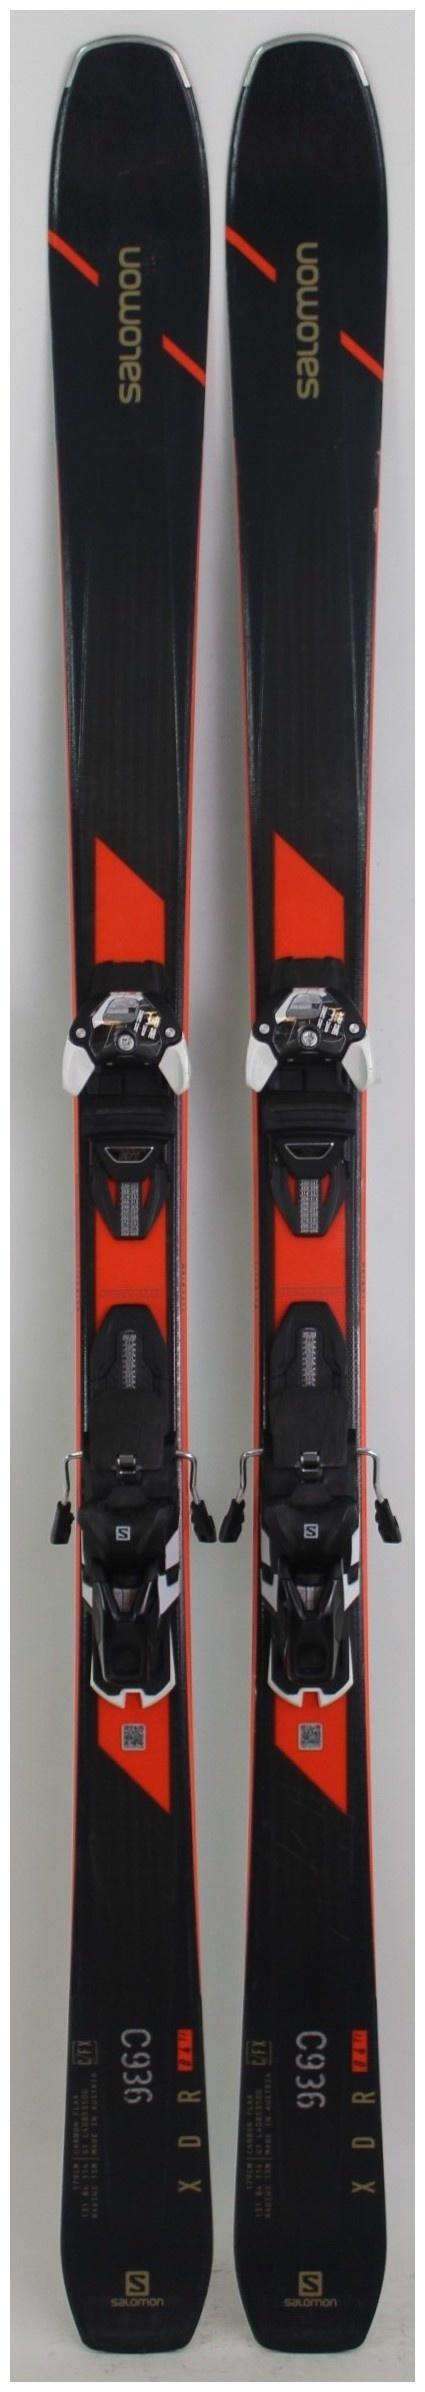 2020, Salomon, XDR 84 Ti Skis with Salomon Warden MNC 13 Demo Bindings Used Demo Skis 179cm